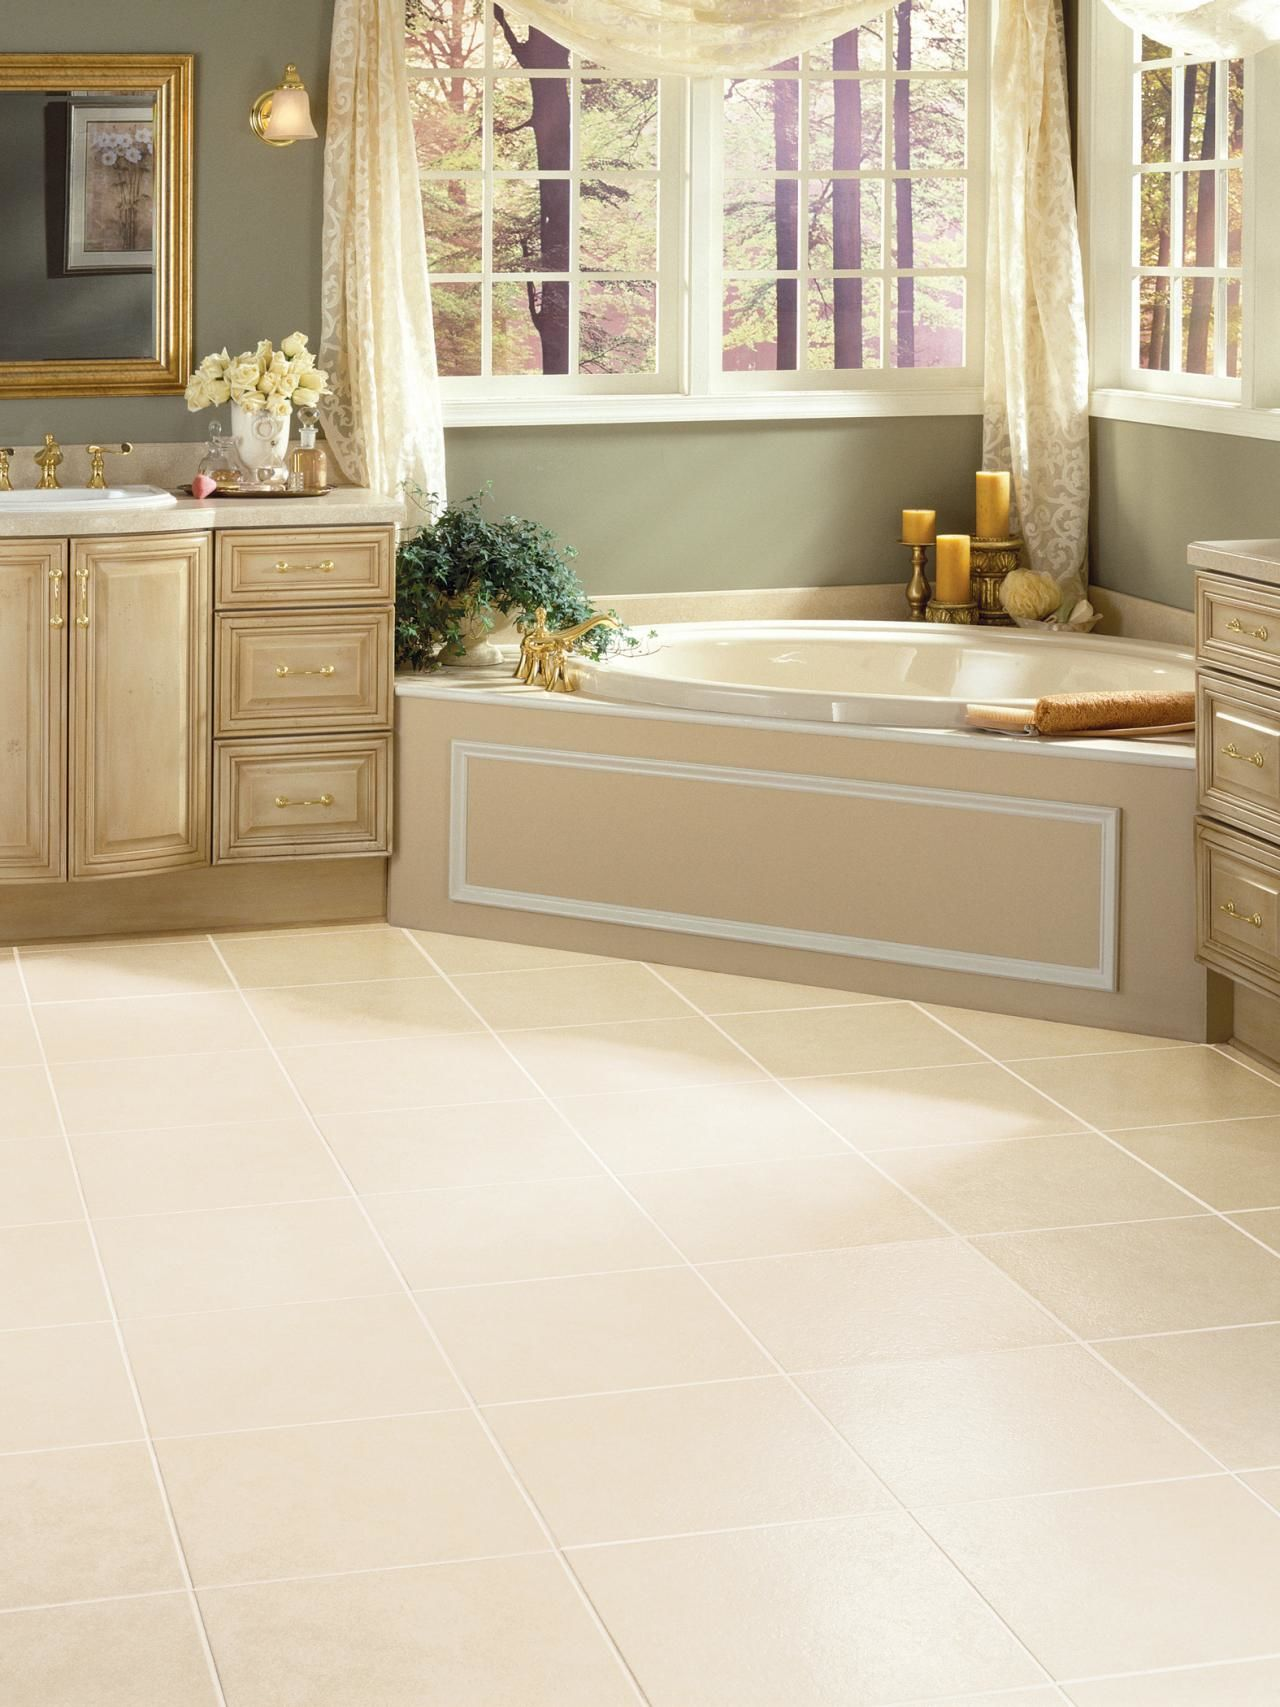 terrific cheap bathroom floor tiles plan-Fascinating Cheap Bathroom Floor Tiles Photo